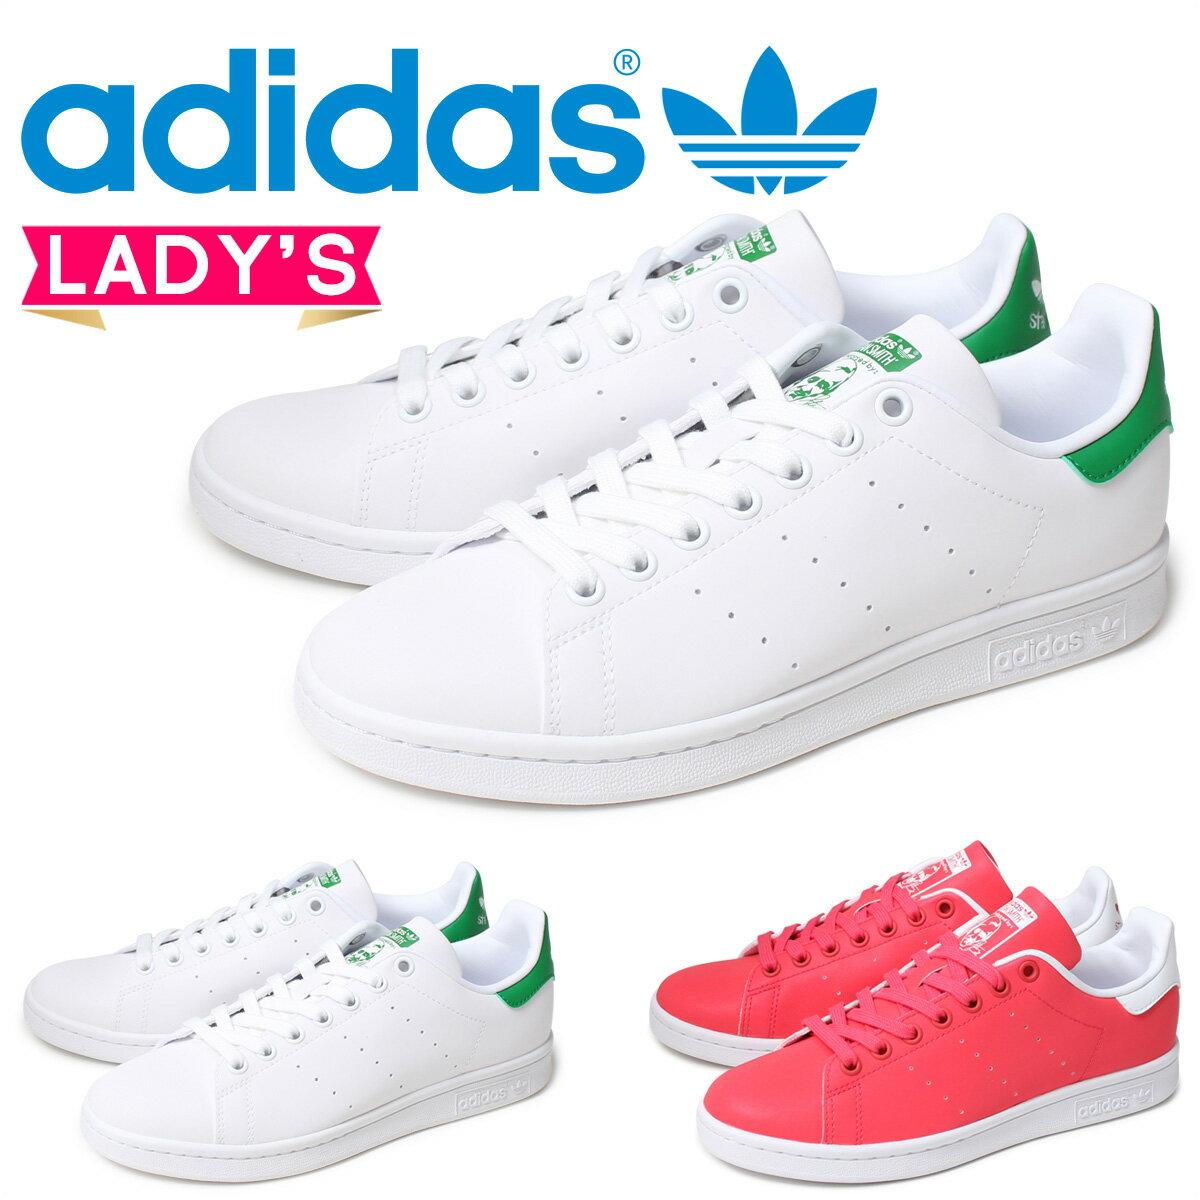 adidas スタンスミス レディース スニーカー アディダス Originals STAN SMITH W BB5153 BB5154 靴 ホワイト ピンク オリジナルス